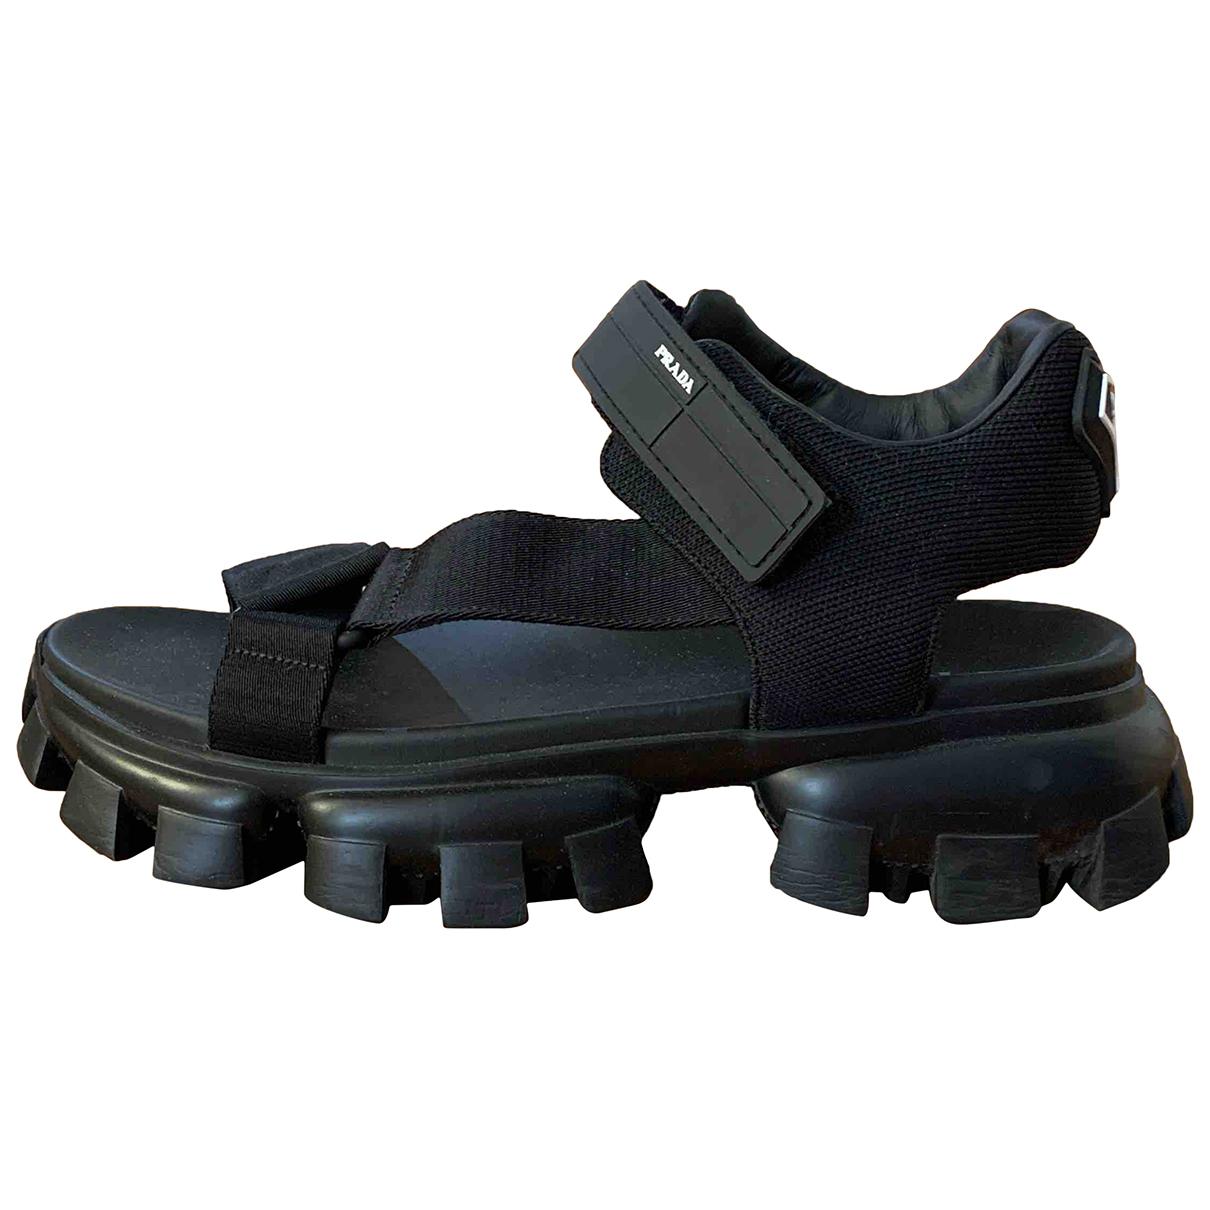 Prada N Black Leather Sandals for Men 10 US